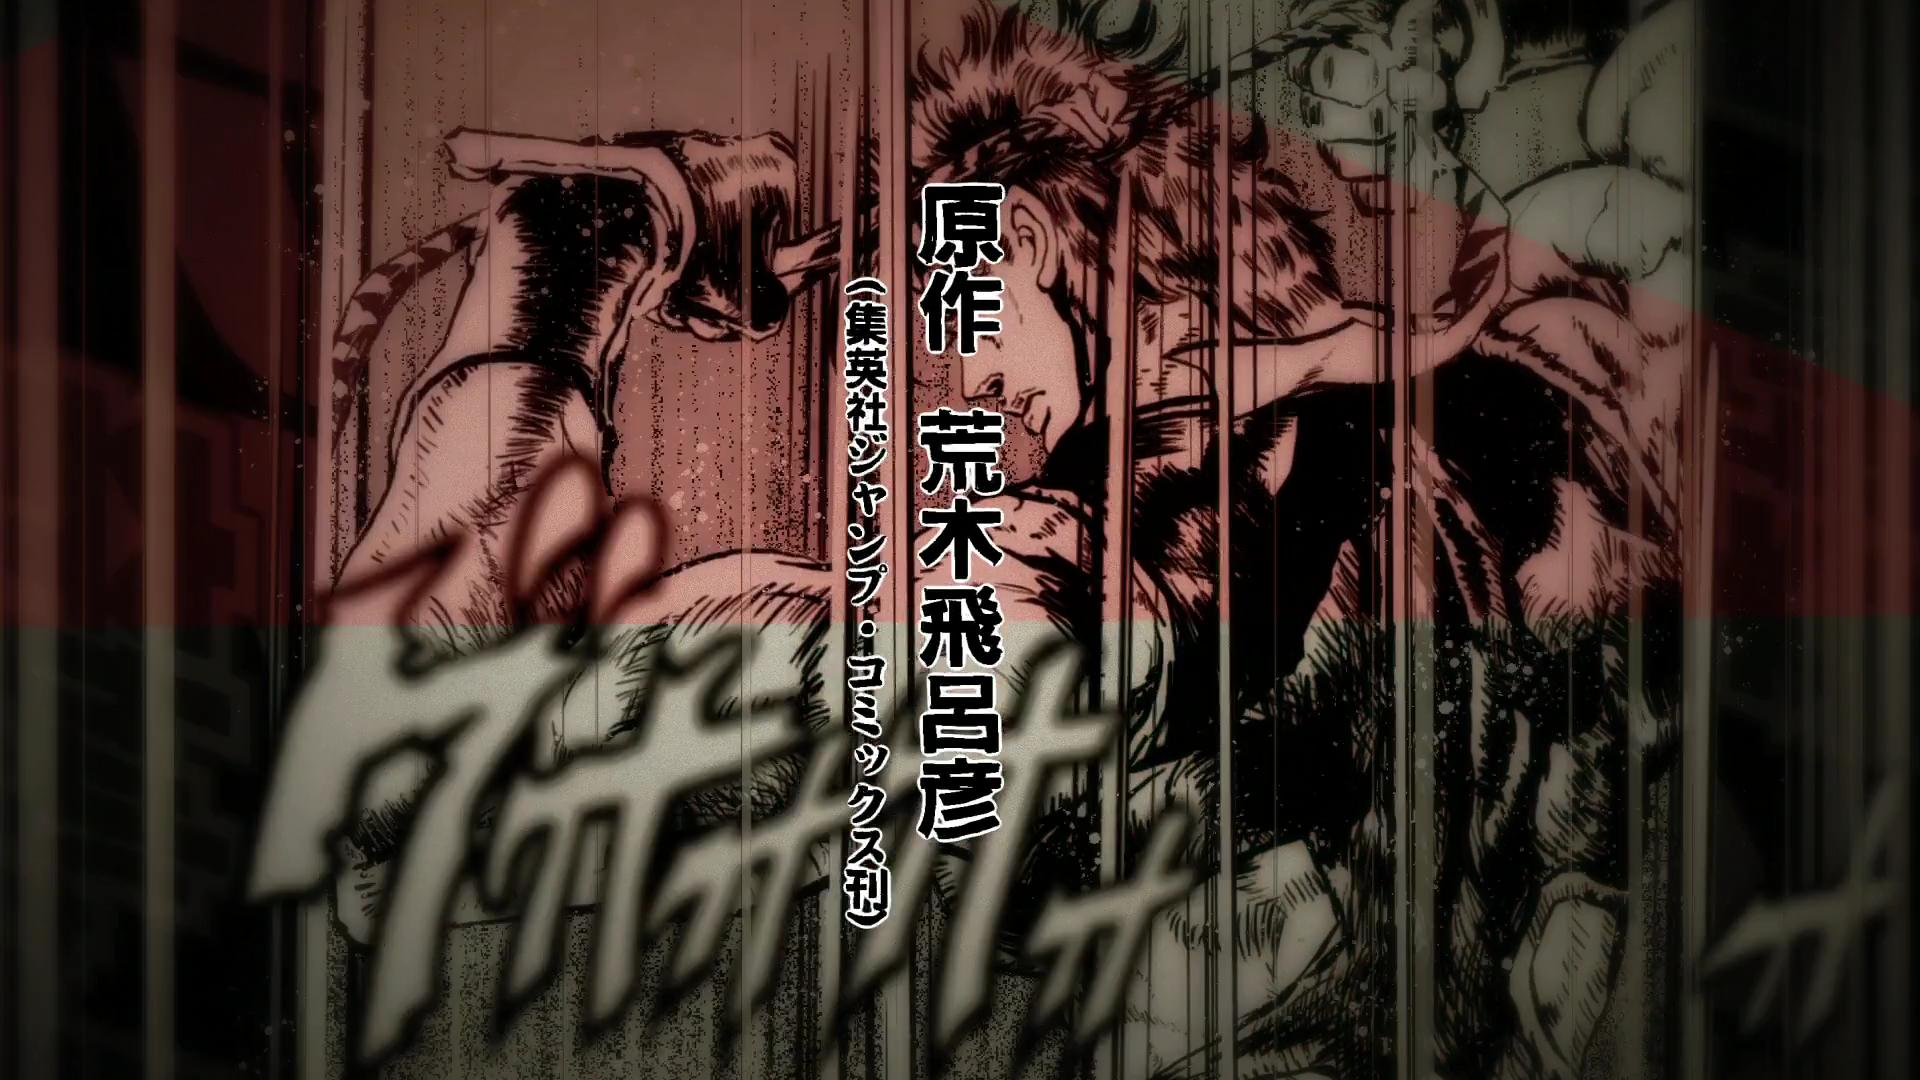 JosephPrepareChariotBattle AnimePartIOP1